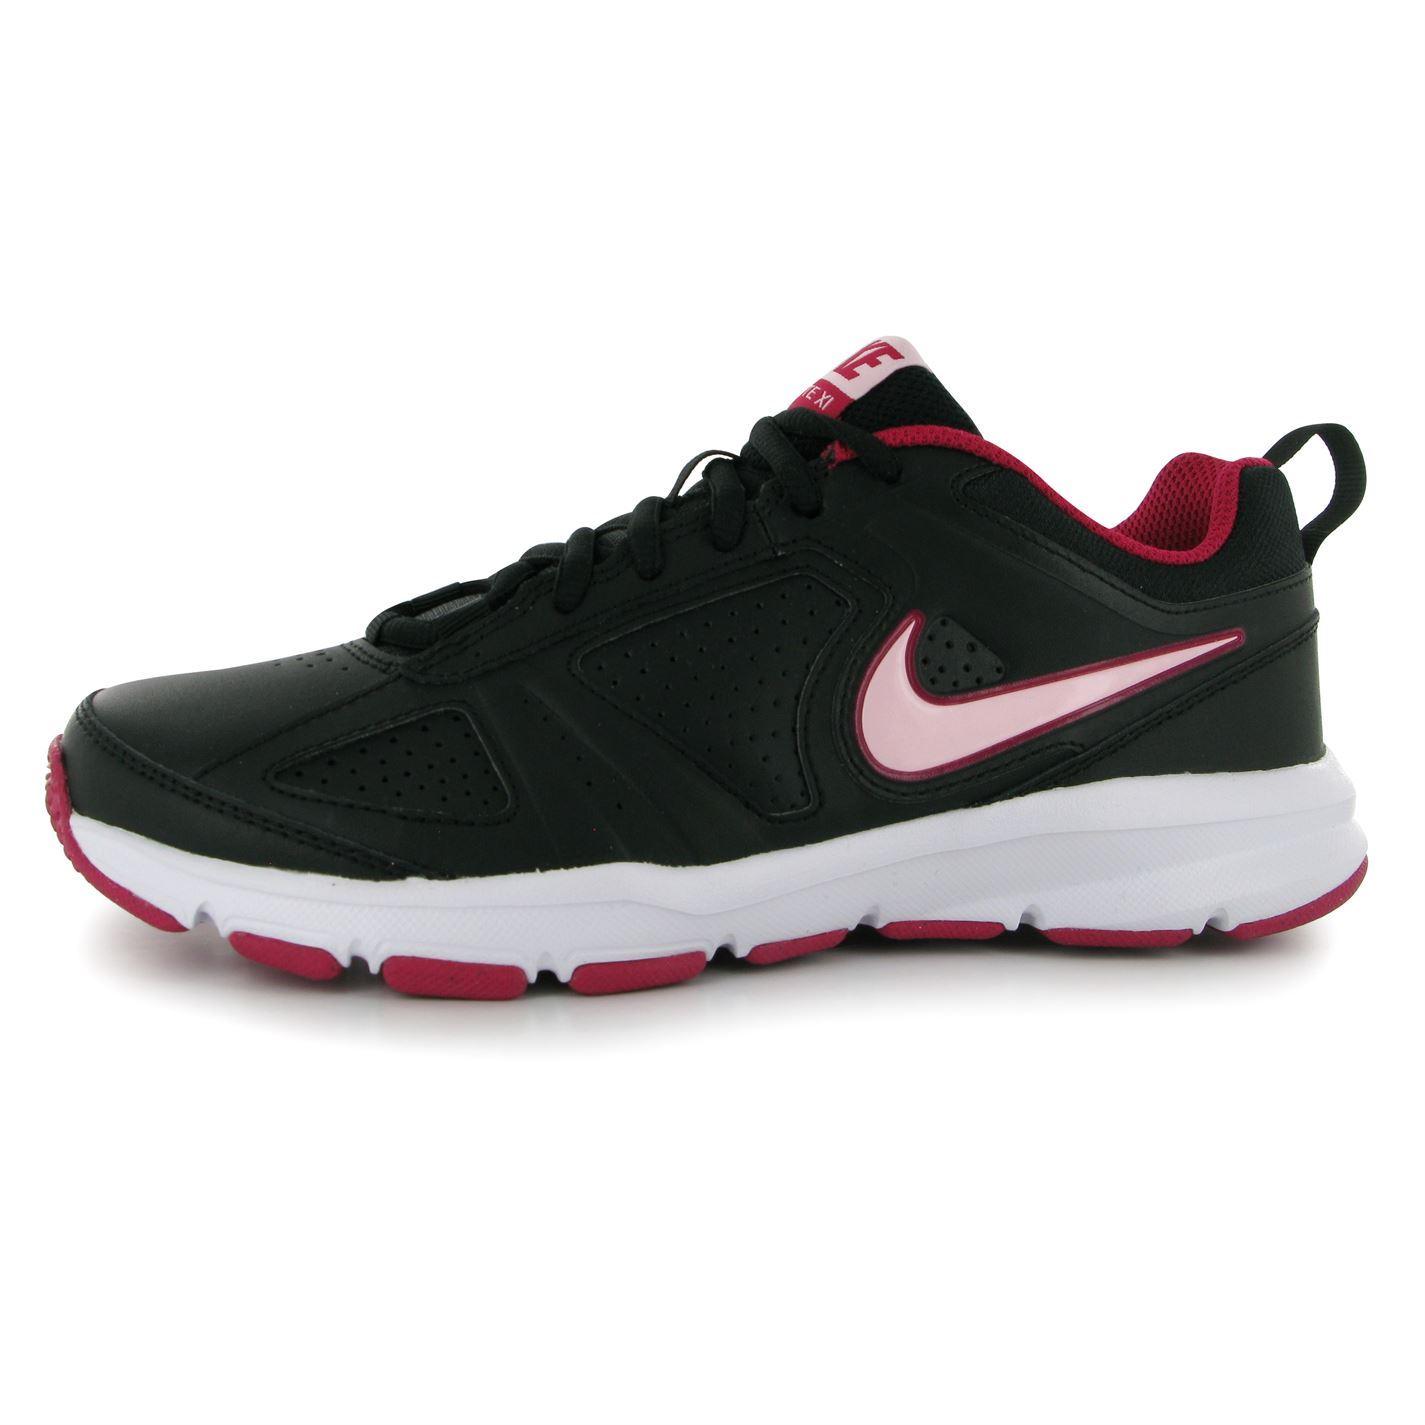 Nike trainers t lite xi women s sneakers sports runing shoes black - Nike T Lite Xi Shoes Trainers Womens Black Pink Sneakers